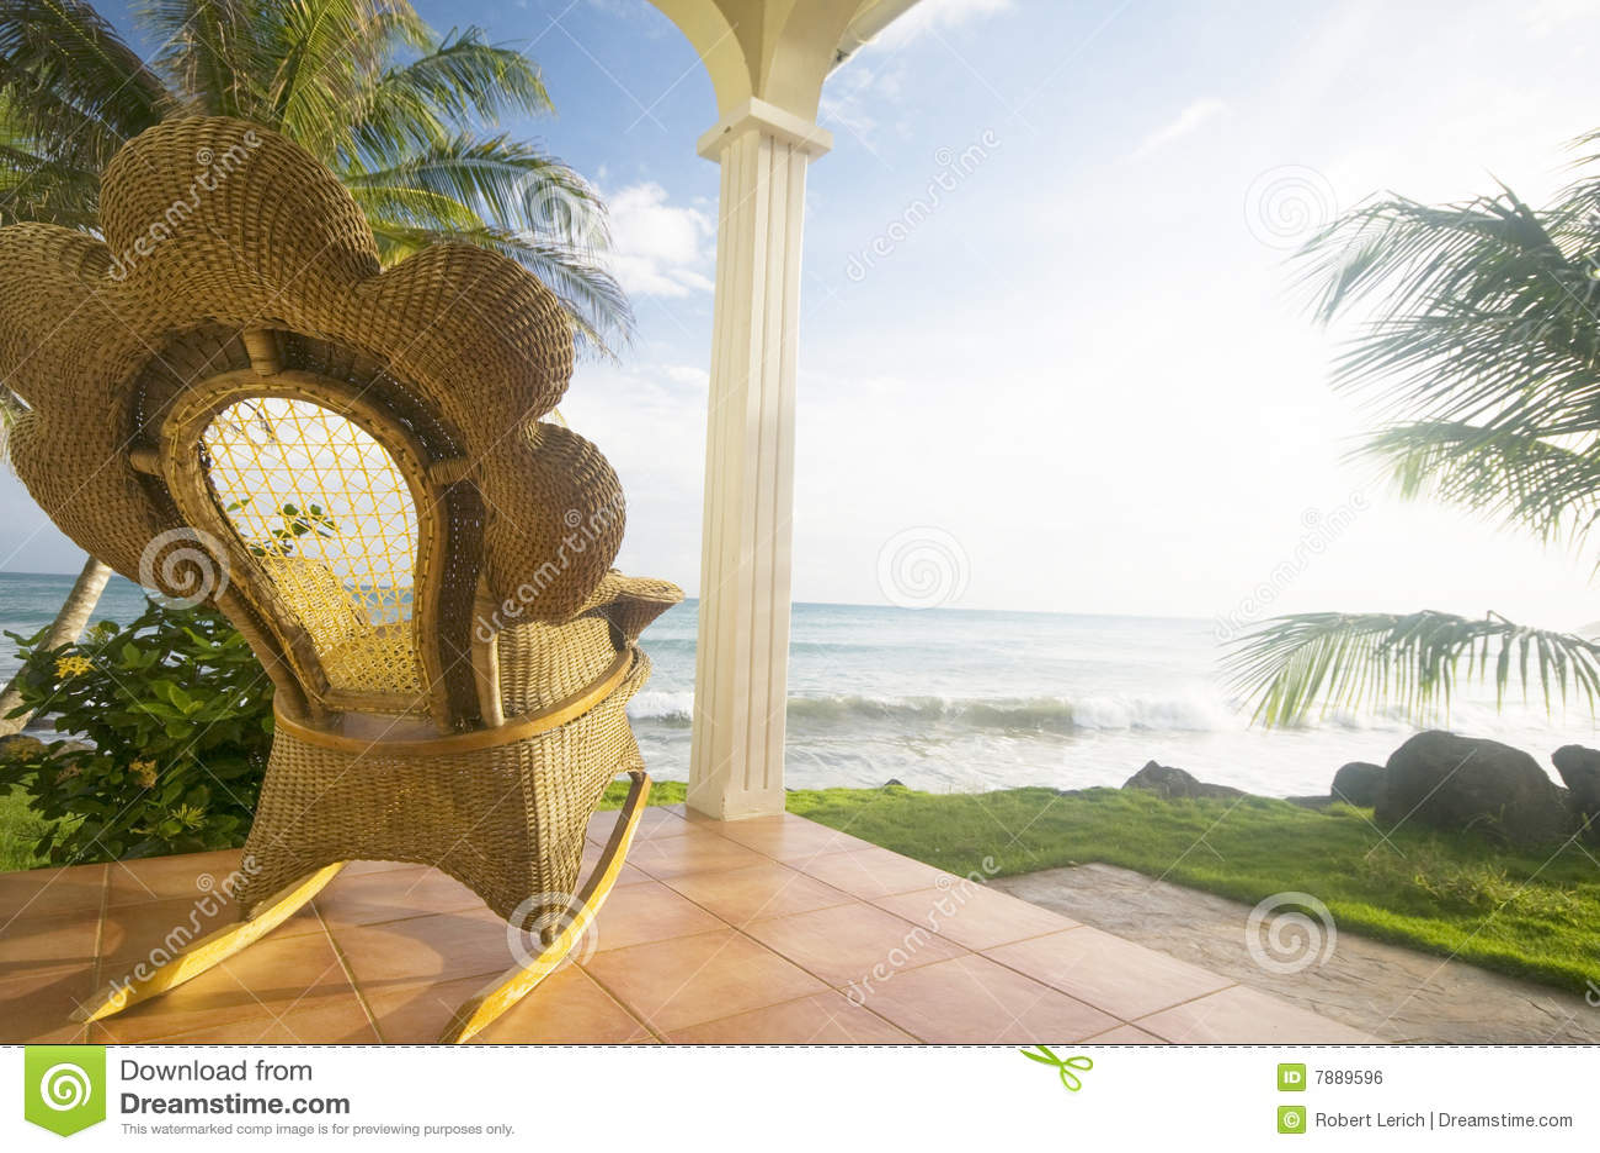 Handmade wicker rocking chair on patio luxury resort hotel caribbean ...